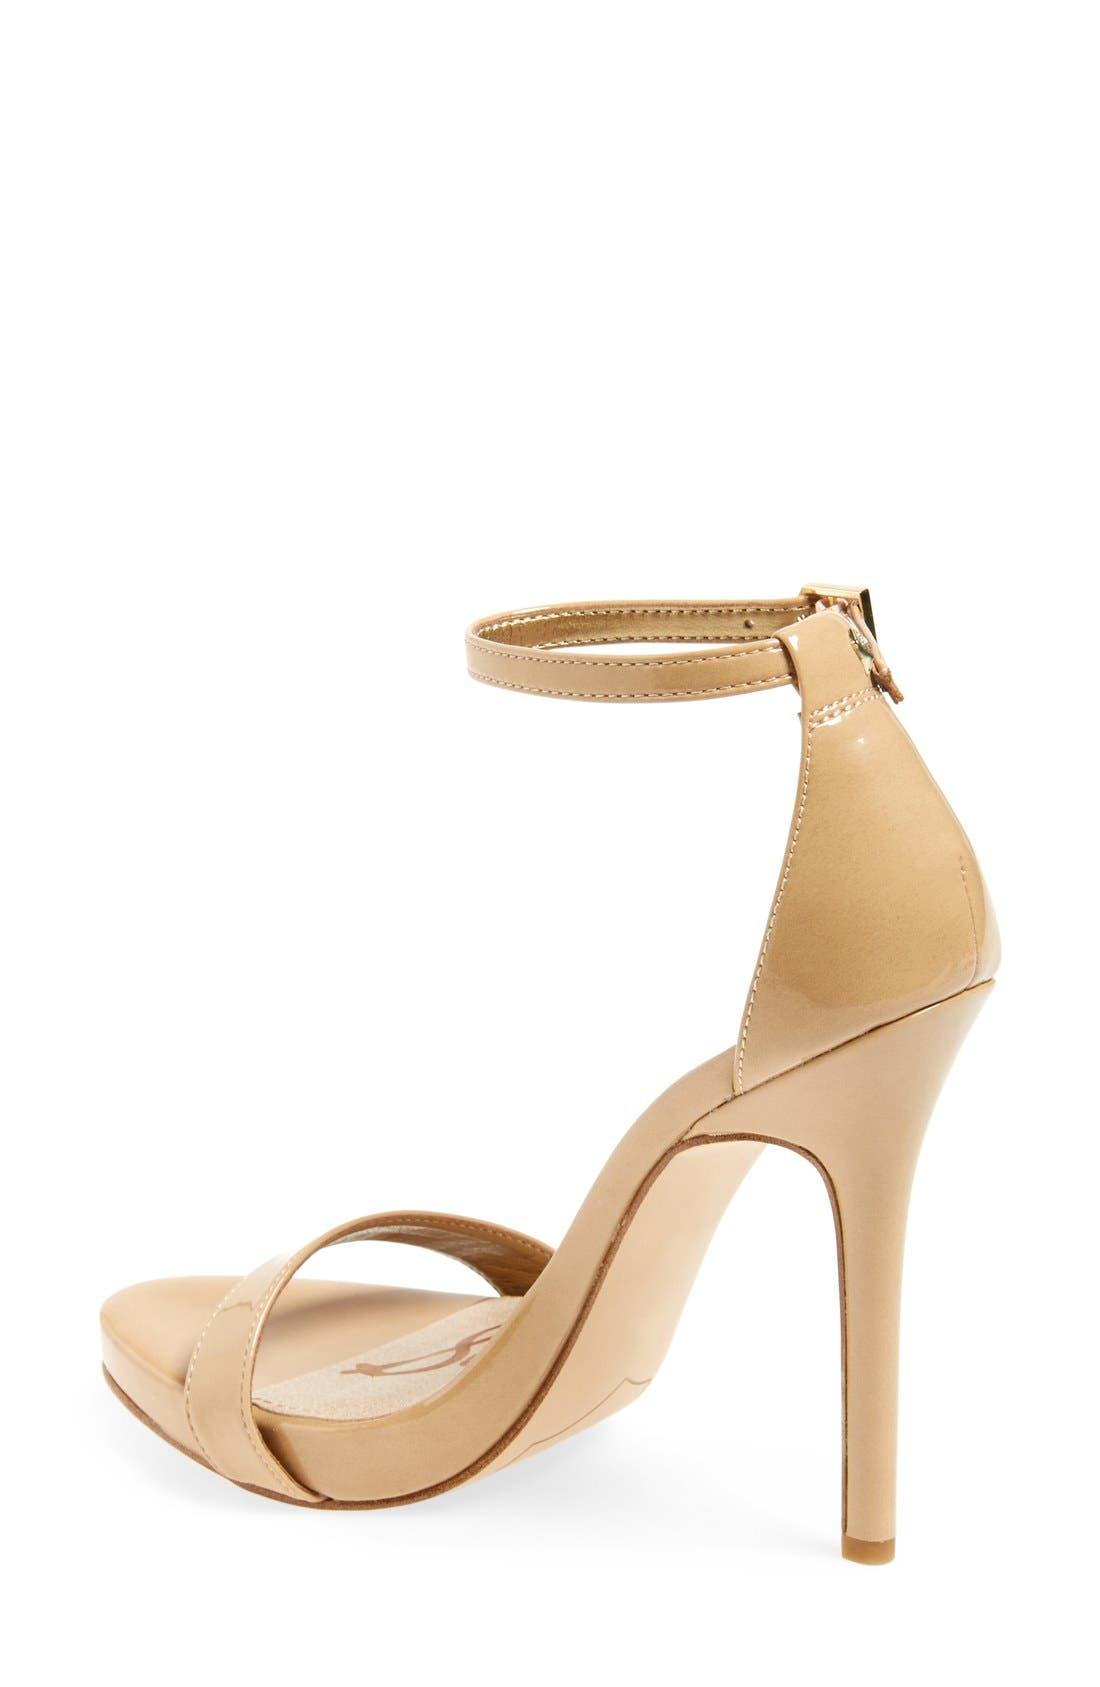 ,                             'Eleanor' Ankle Strap Sandal,                             Alternate thumbnail 105, color,                             252